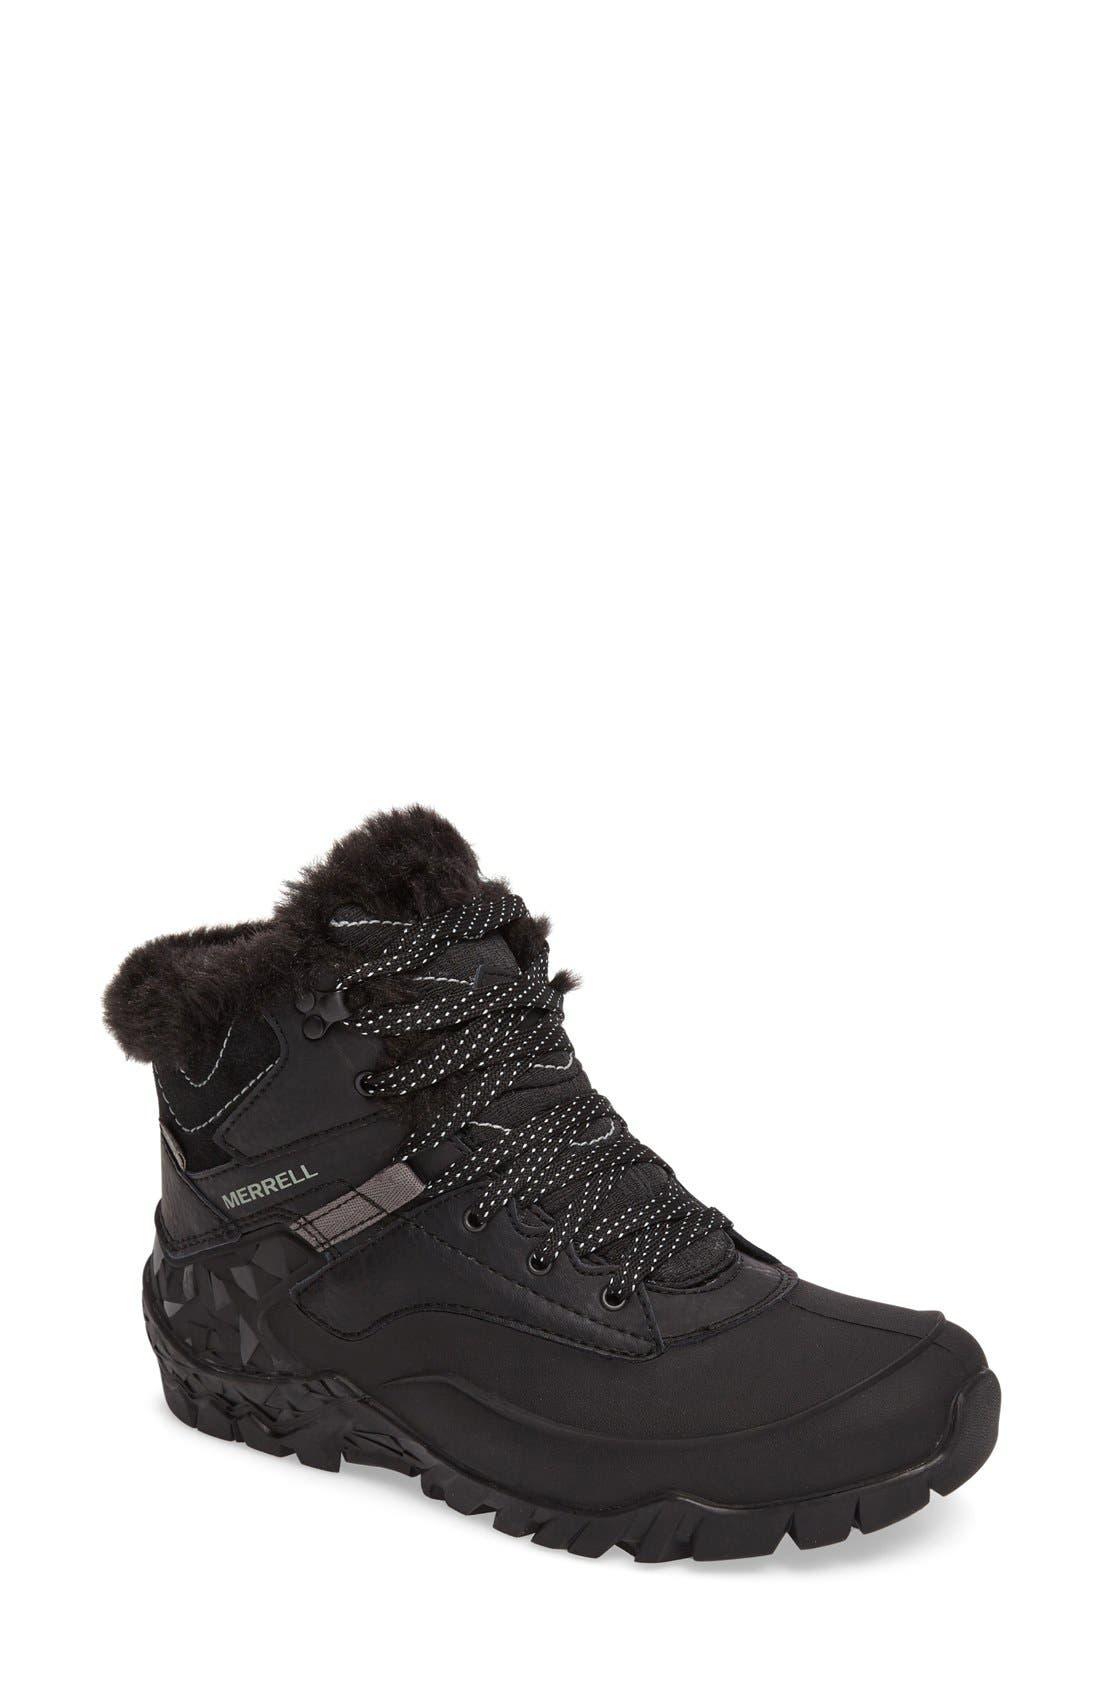 Merrell Aurora 6 Waterproof Faux Fur Lined Boot, Black